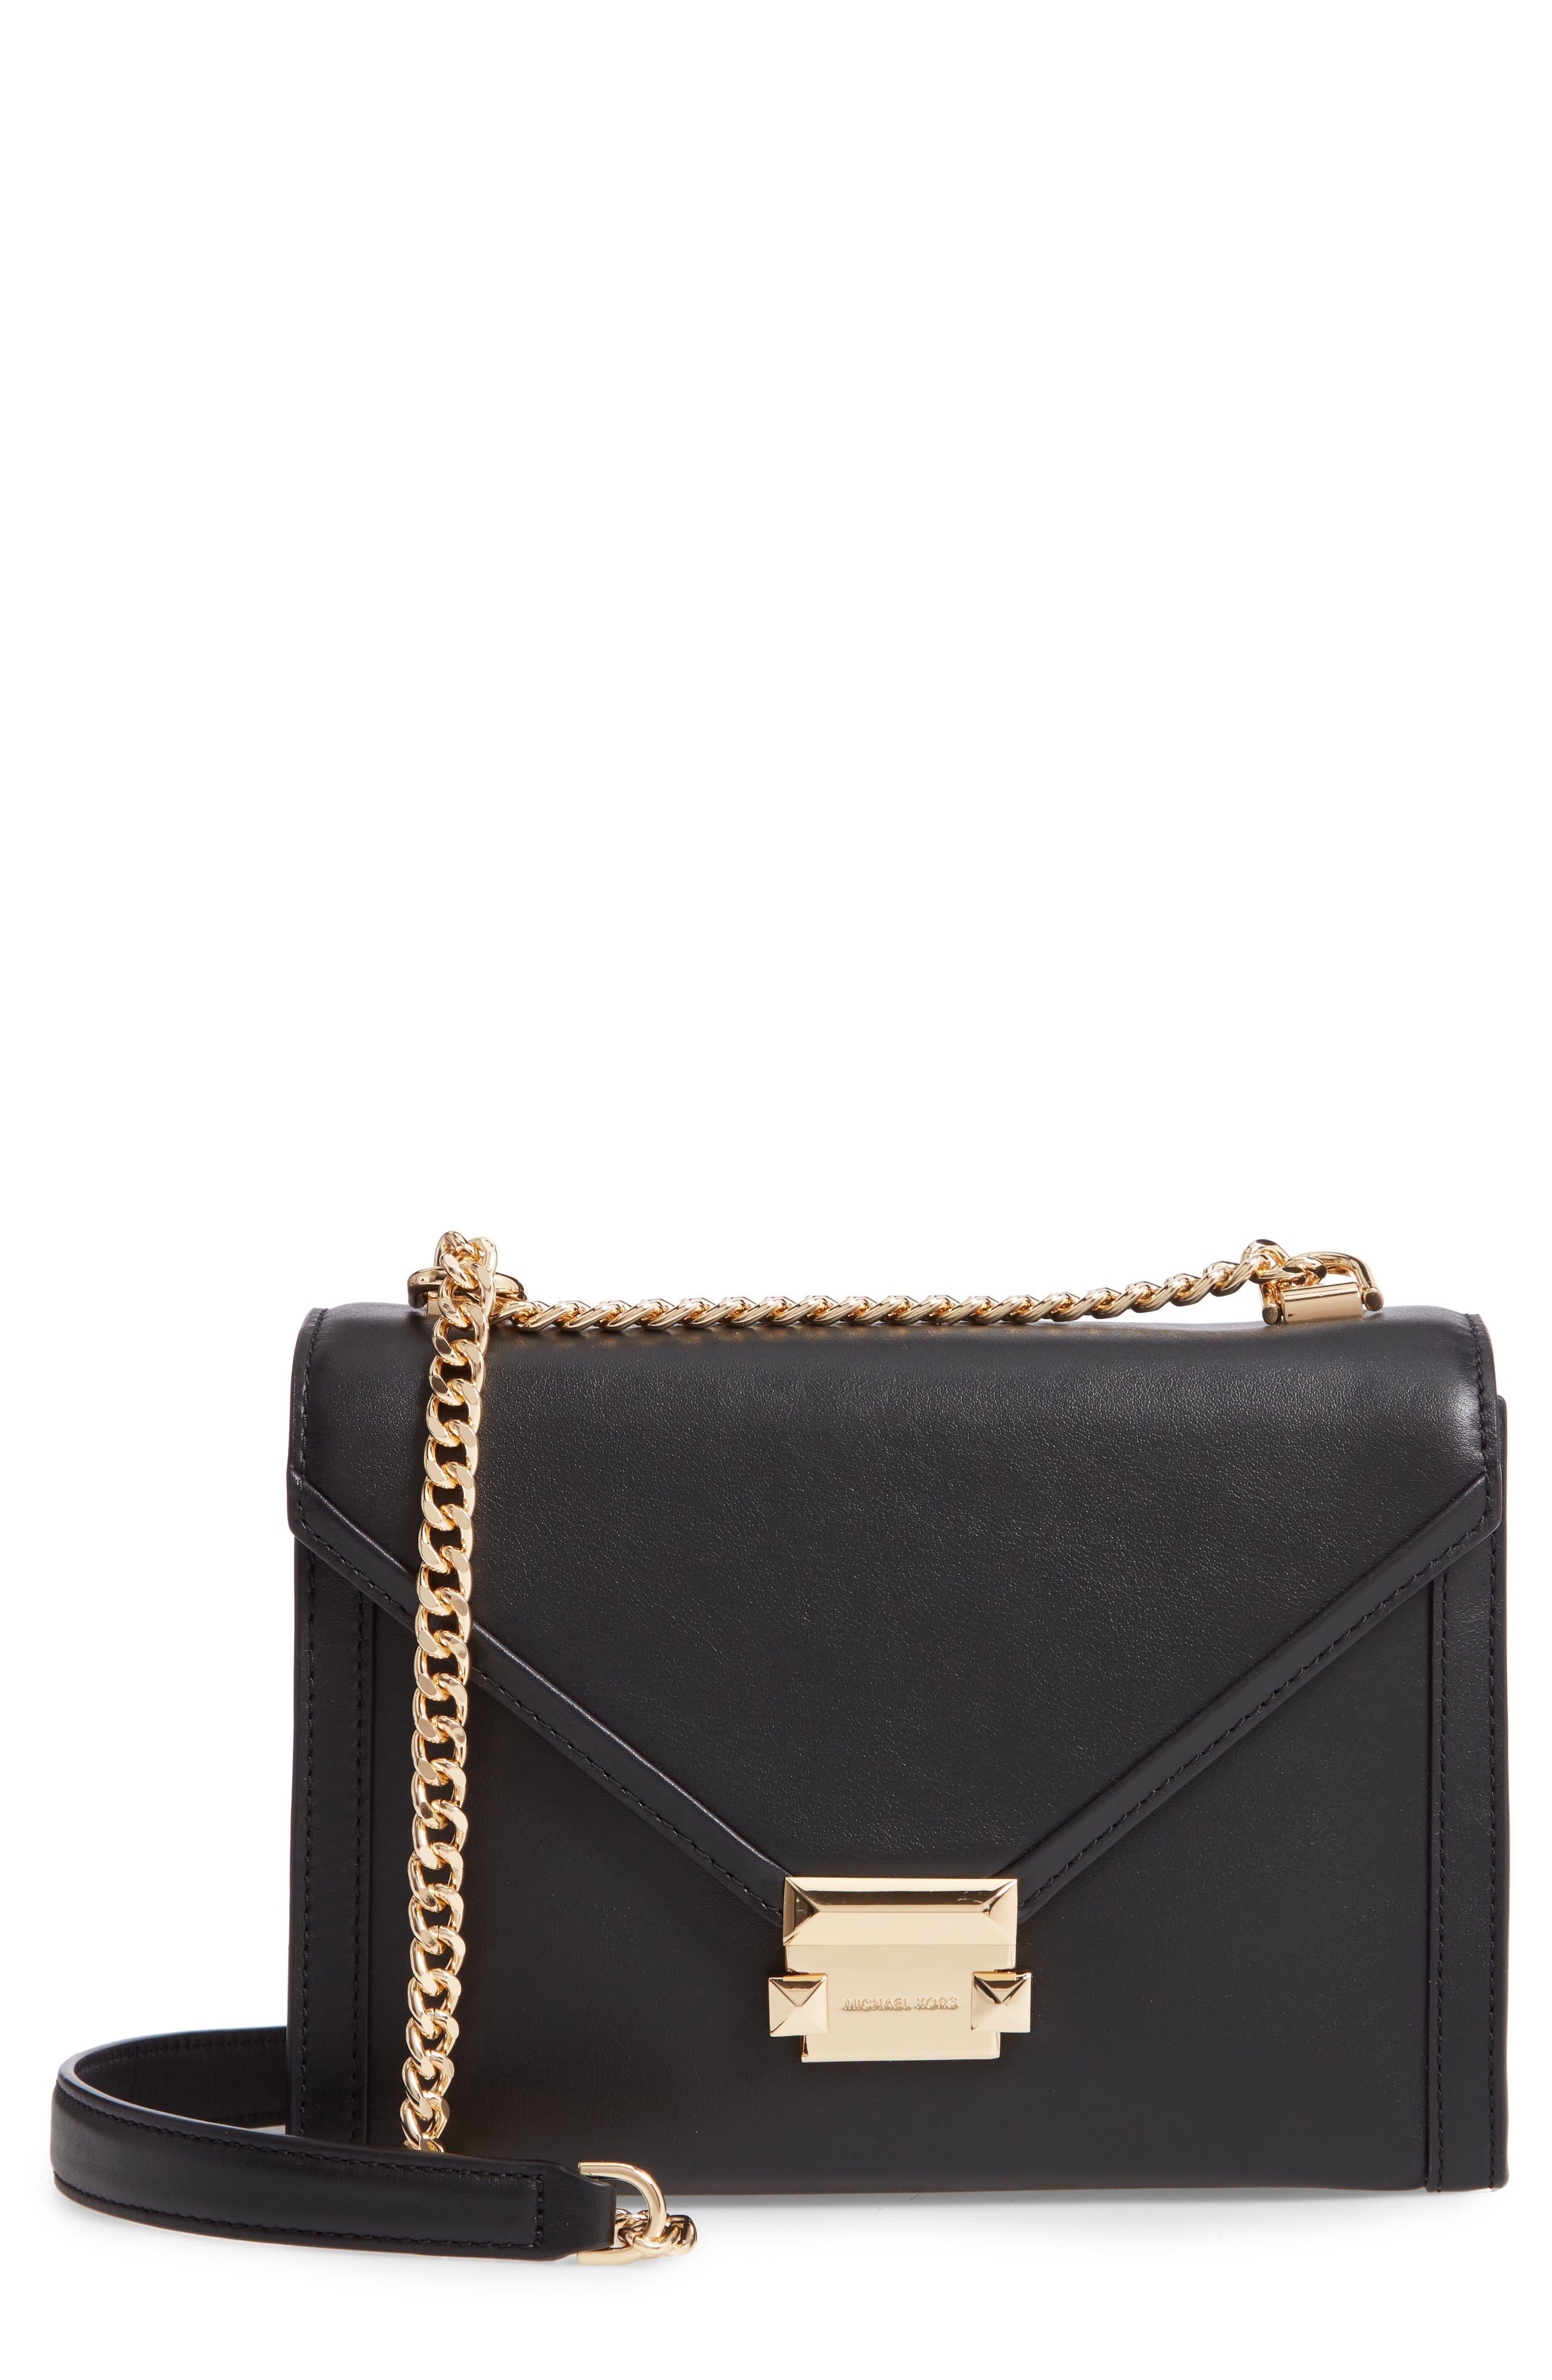 MICHAEL MICHAEL KORS Large Whitney Leather Shoulder Bag, Main, color, BLACK